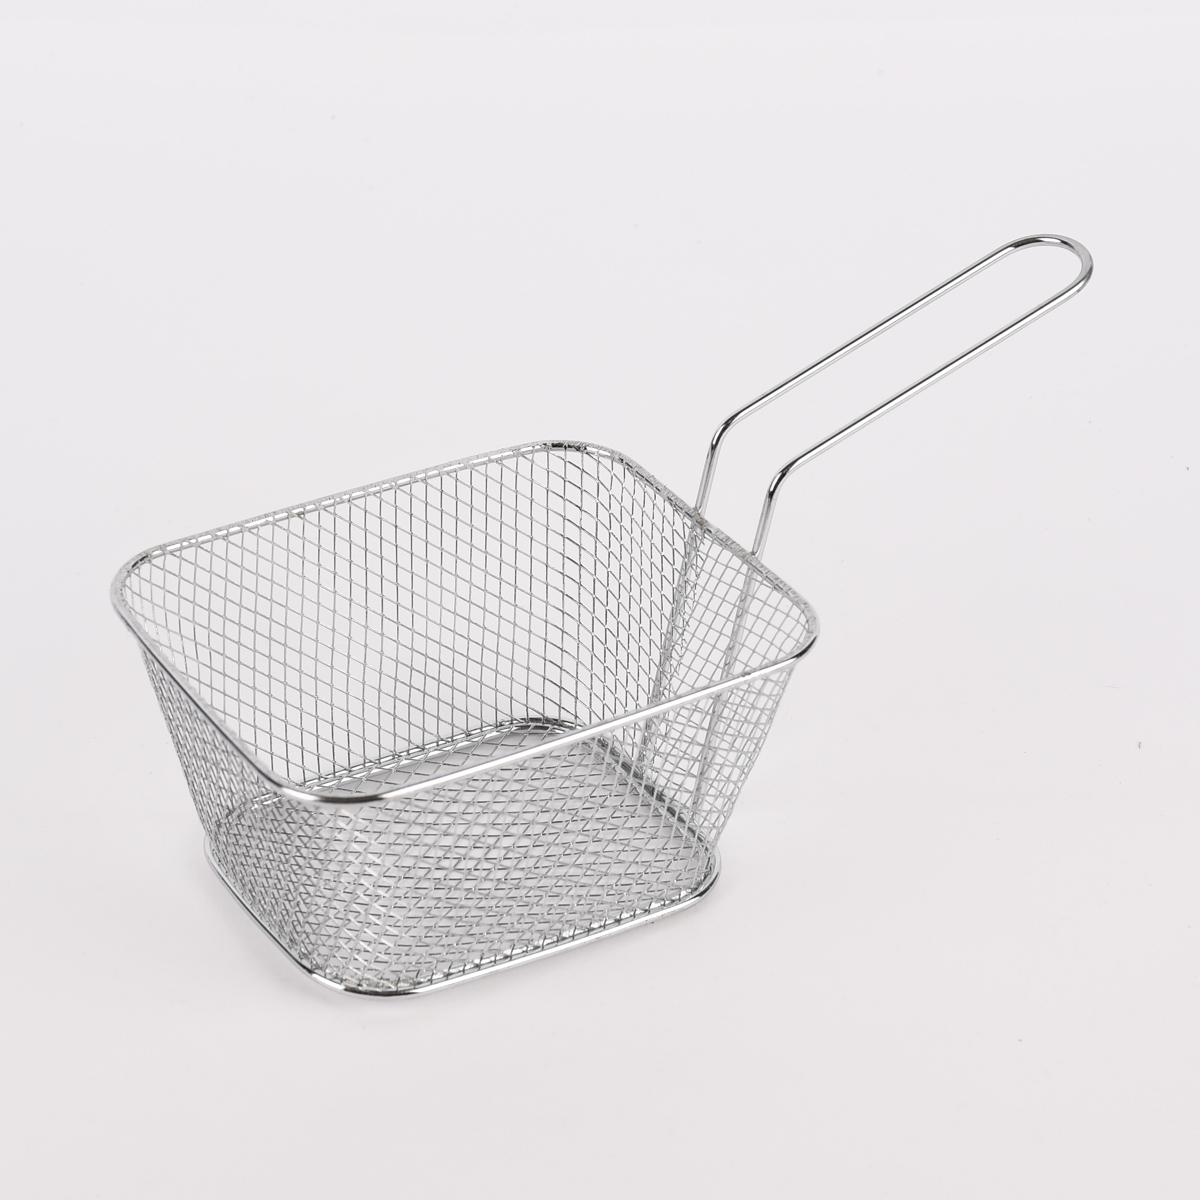 Frittierkorb Servierkorb Metall silber 24x11,5x11,5cm